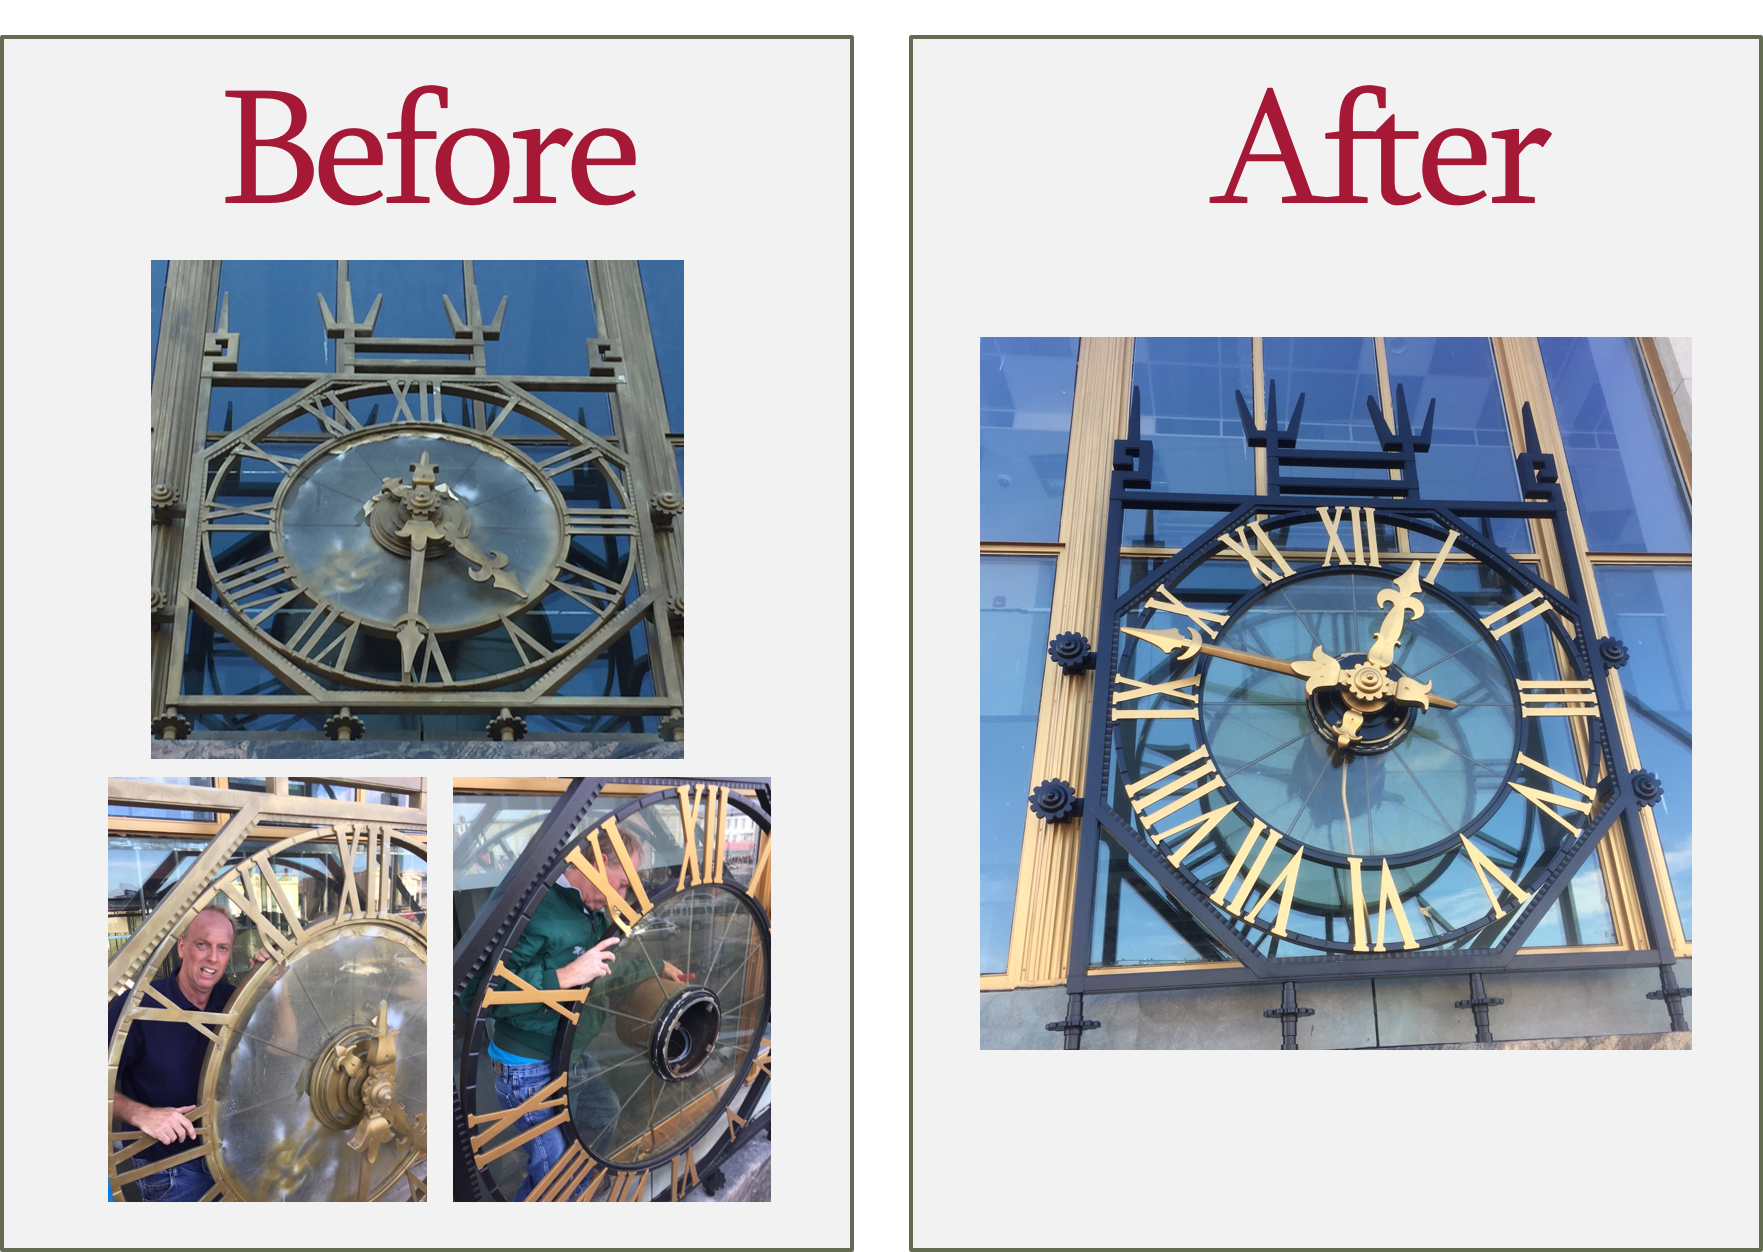 passaic-clock-restoration-before-after